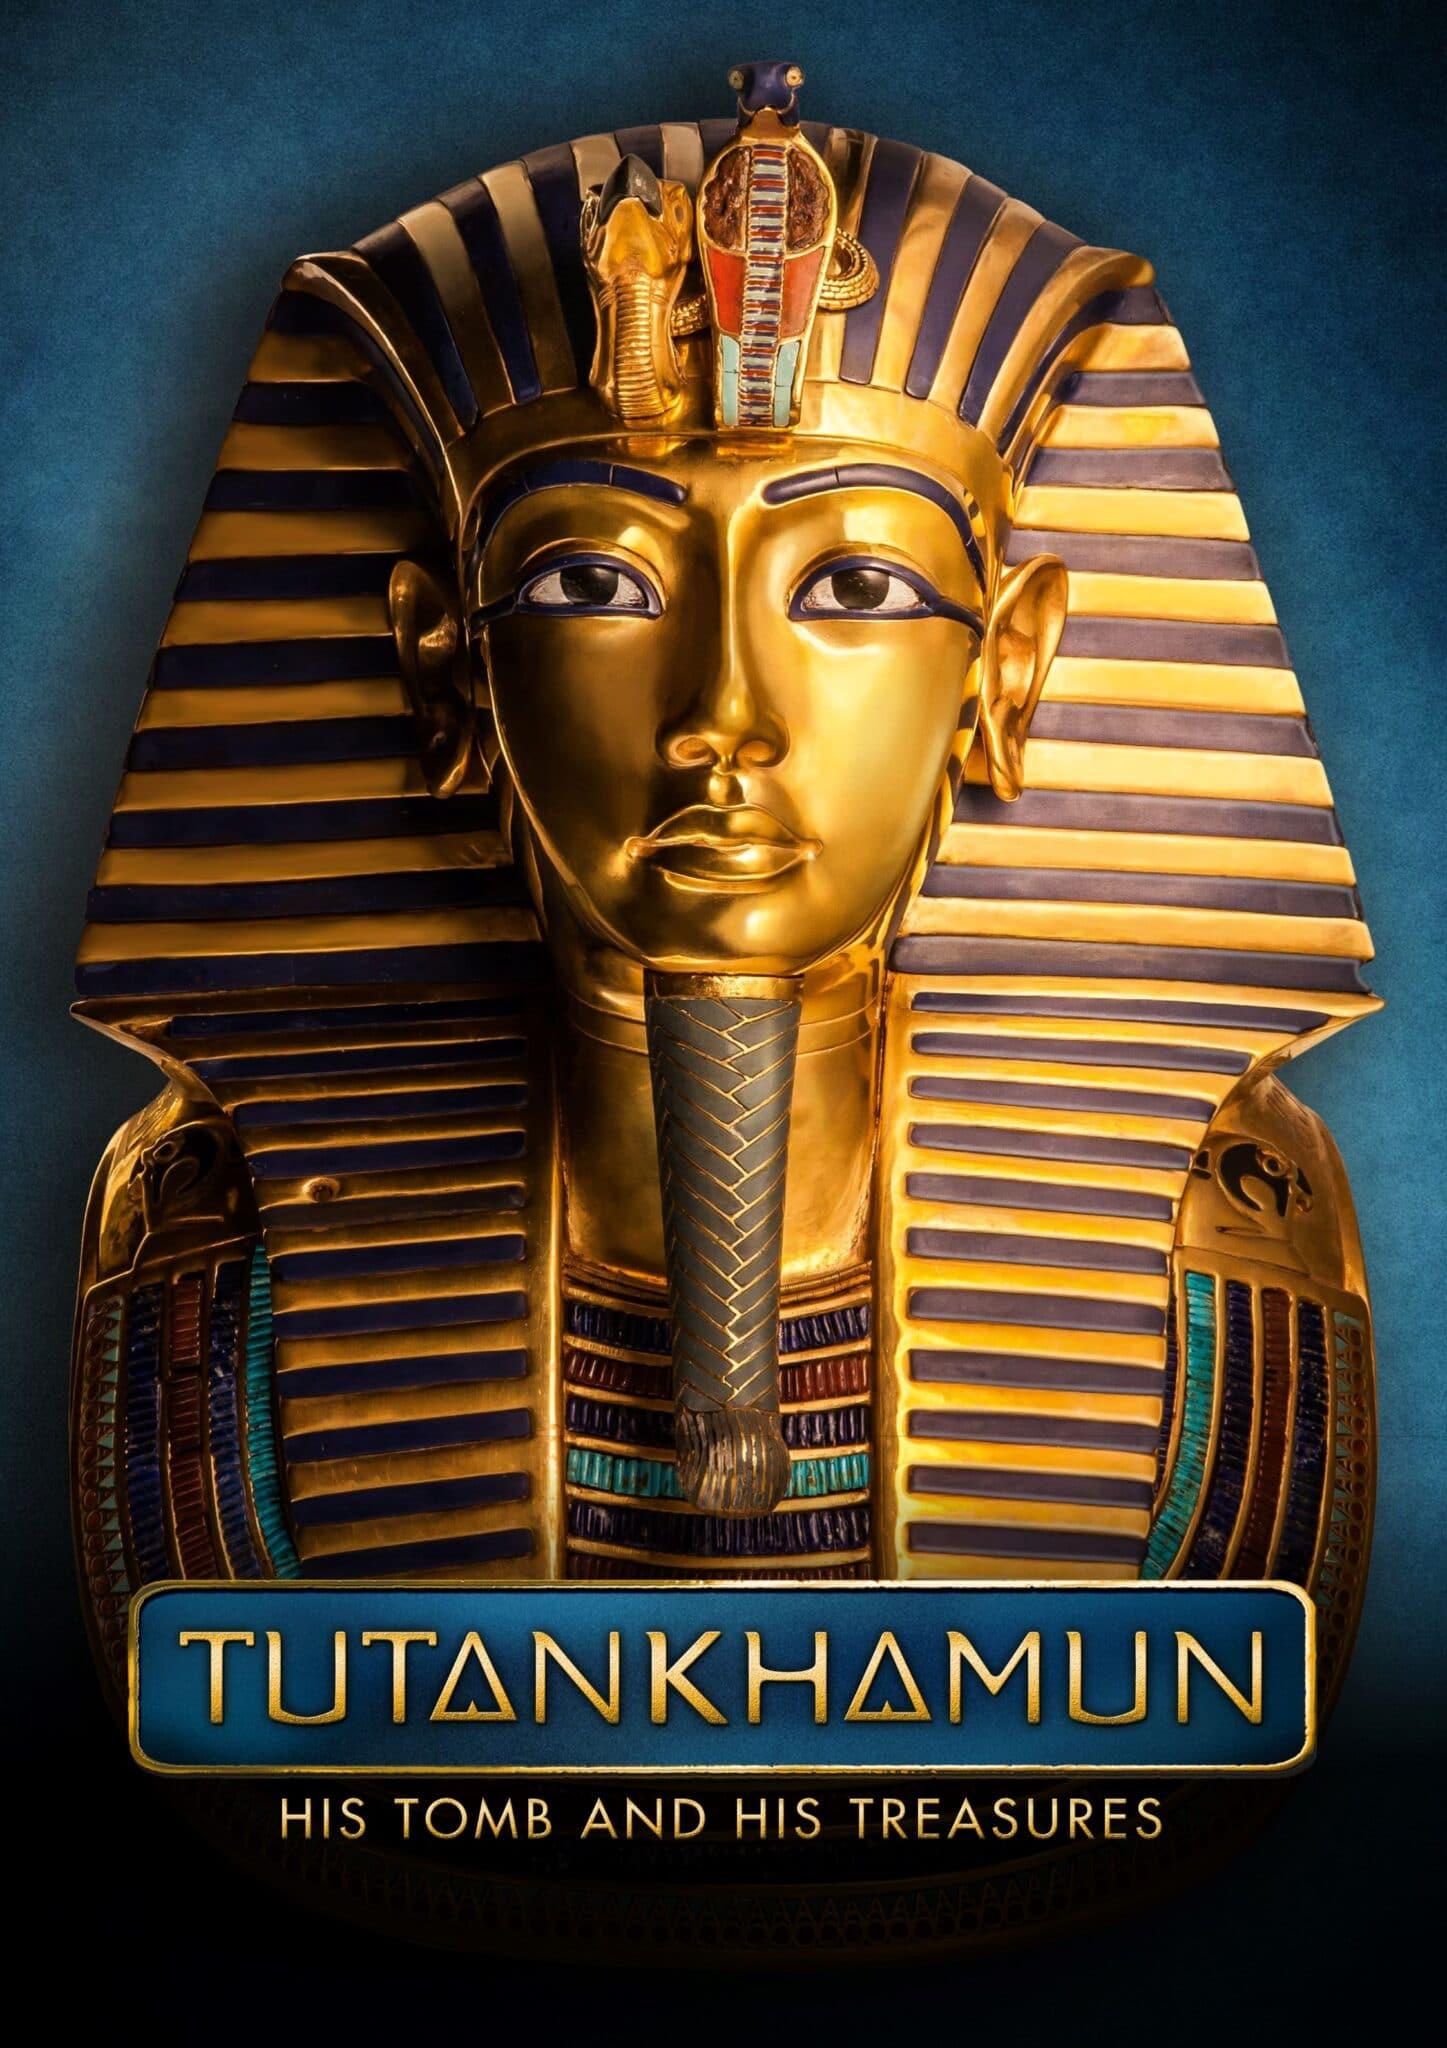 Tutankhamun: His Tomb and His Treasures